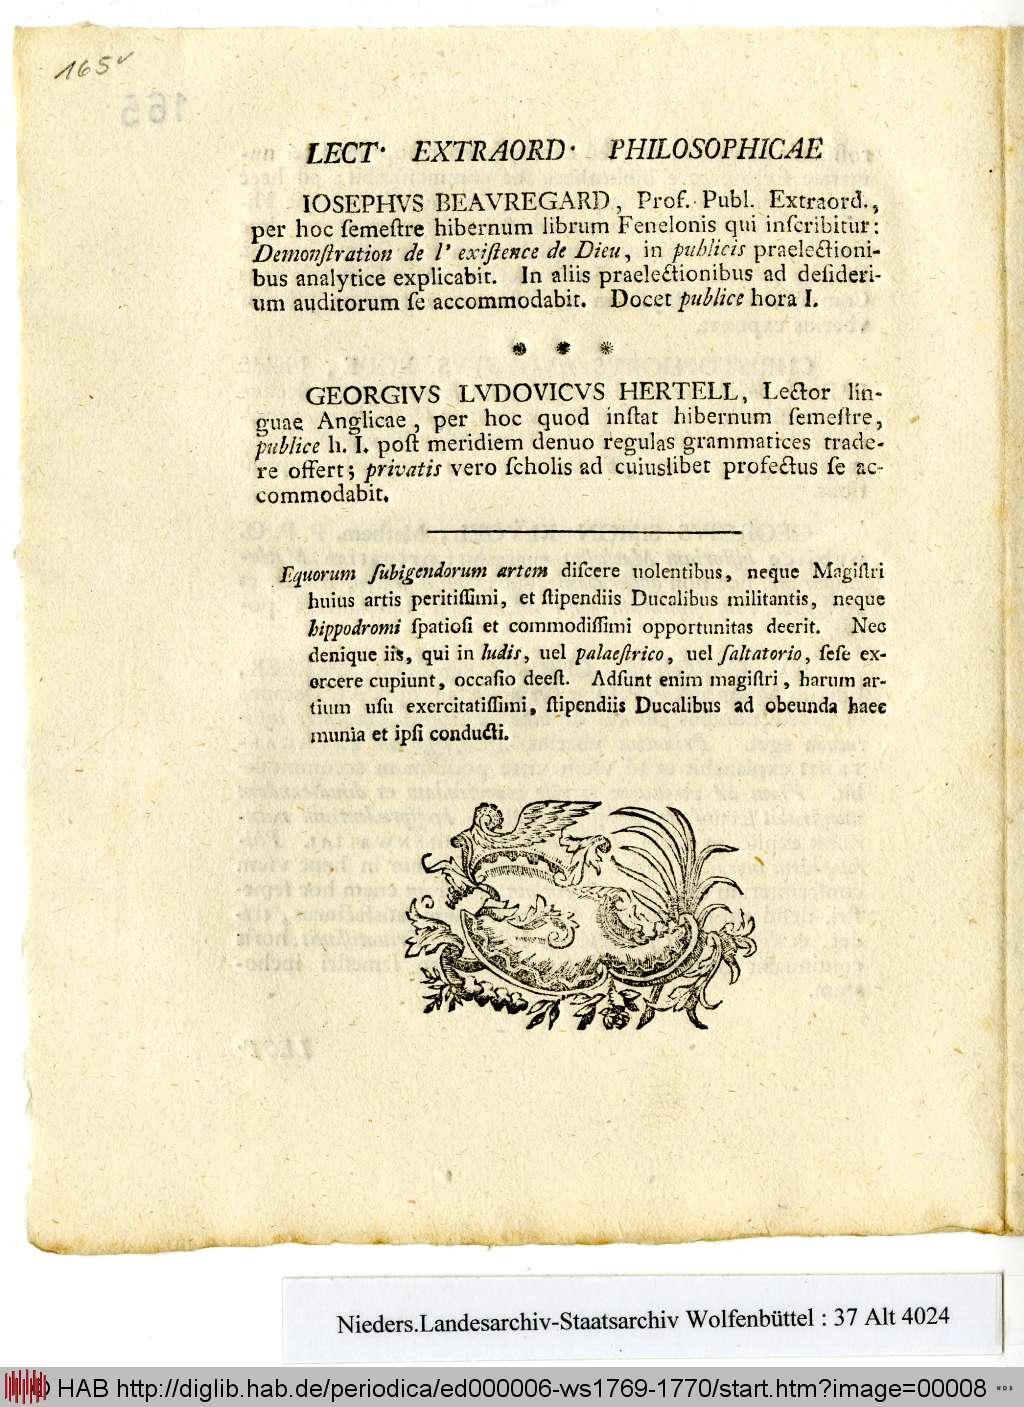 http://diglib.hab.de/periodica/ed000006-ws1769-1770/00008.jpg